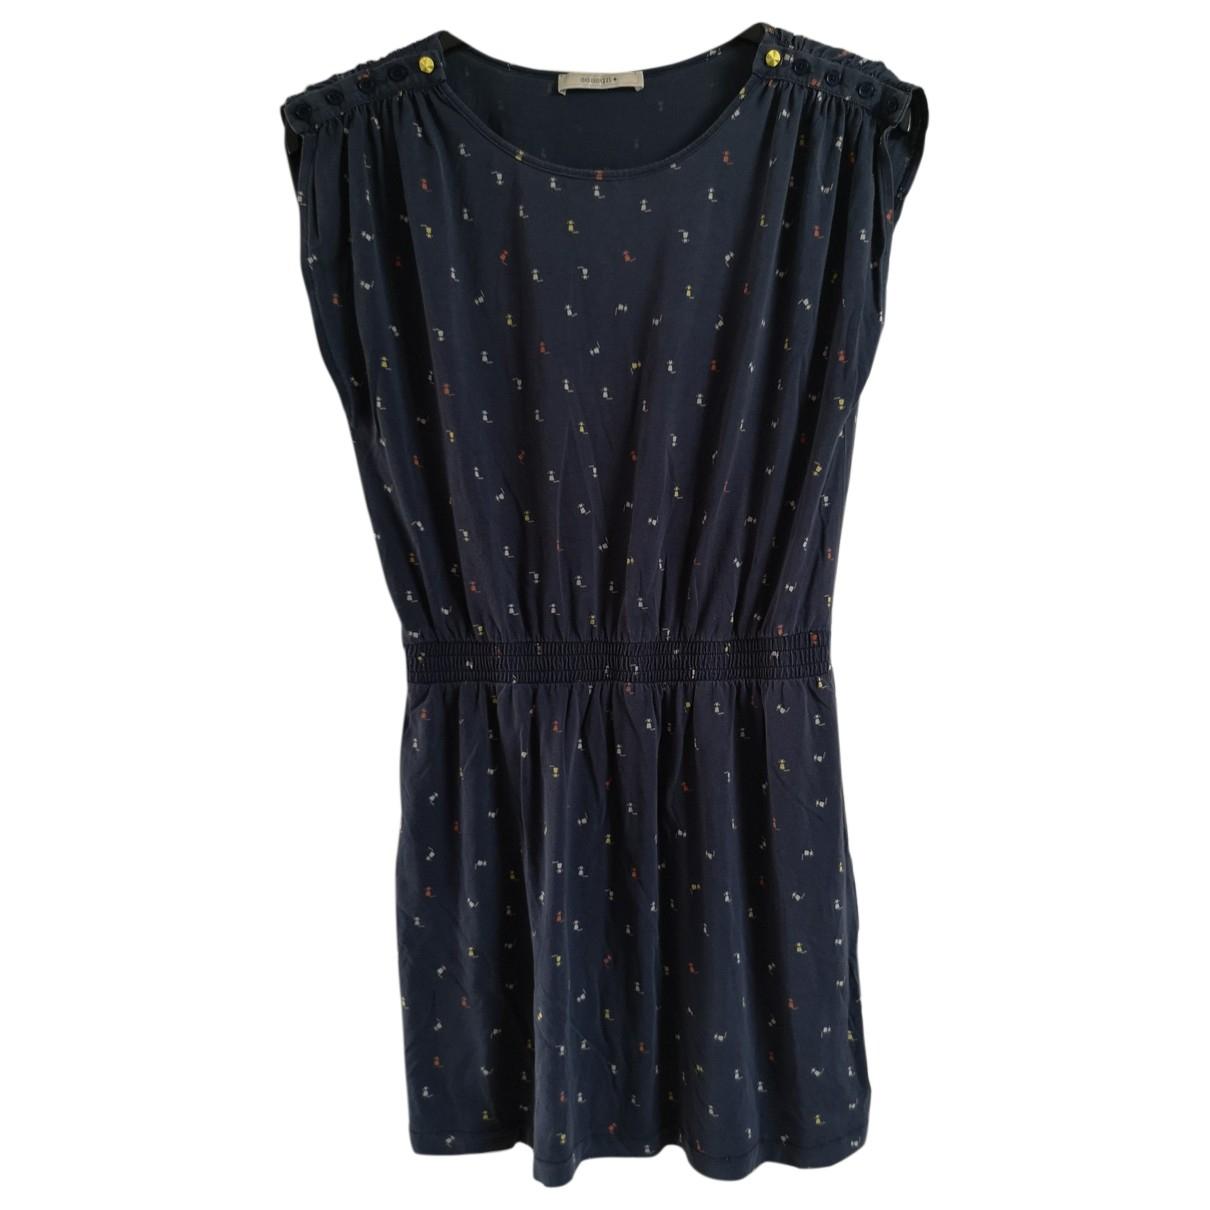 Sessun \N Navy Cotton dress for Women L International